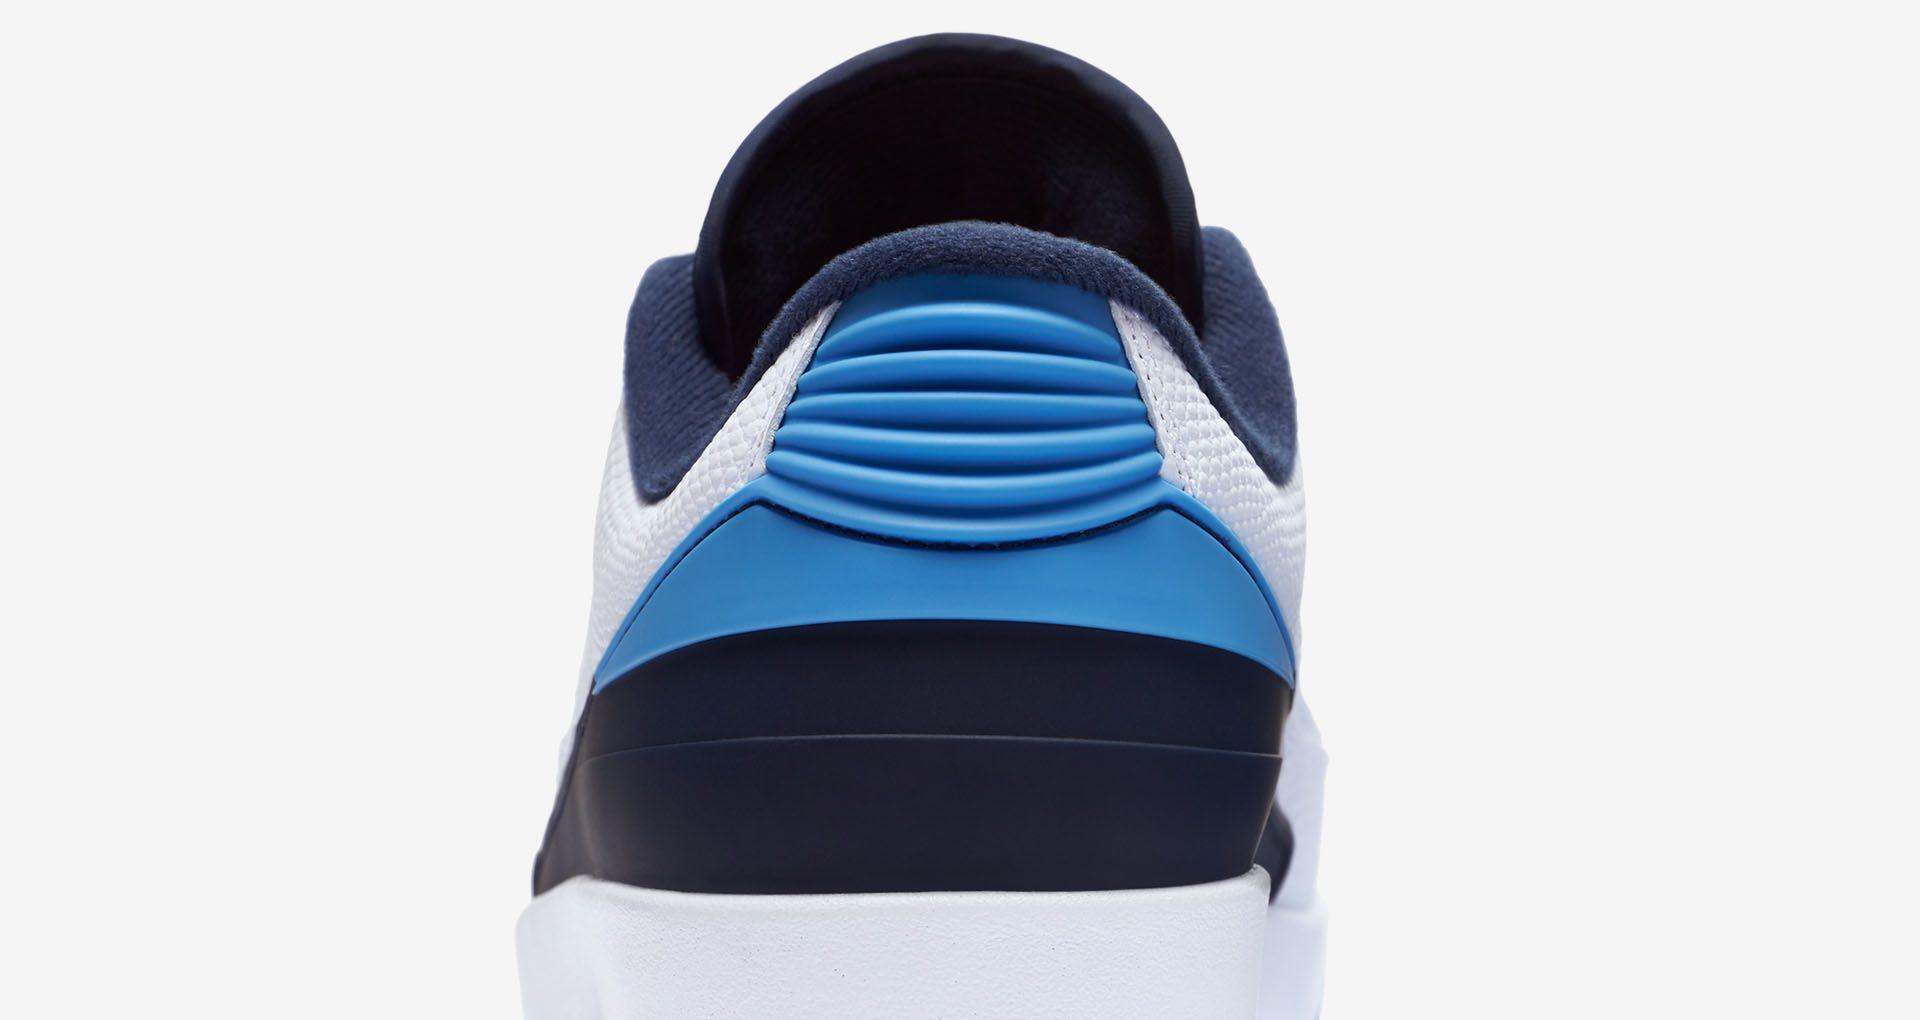 785fc0bb97e341 Air Jordan 2 Retro Low  Midnight Navy  Release Date. Nike+ SNKRS